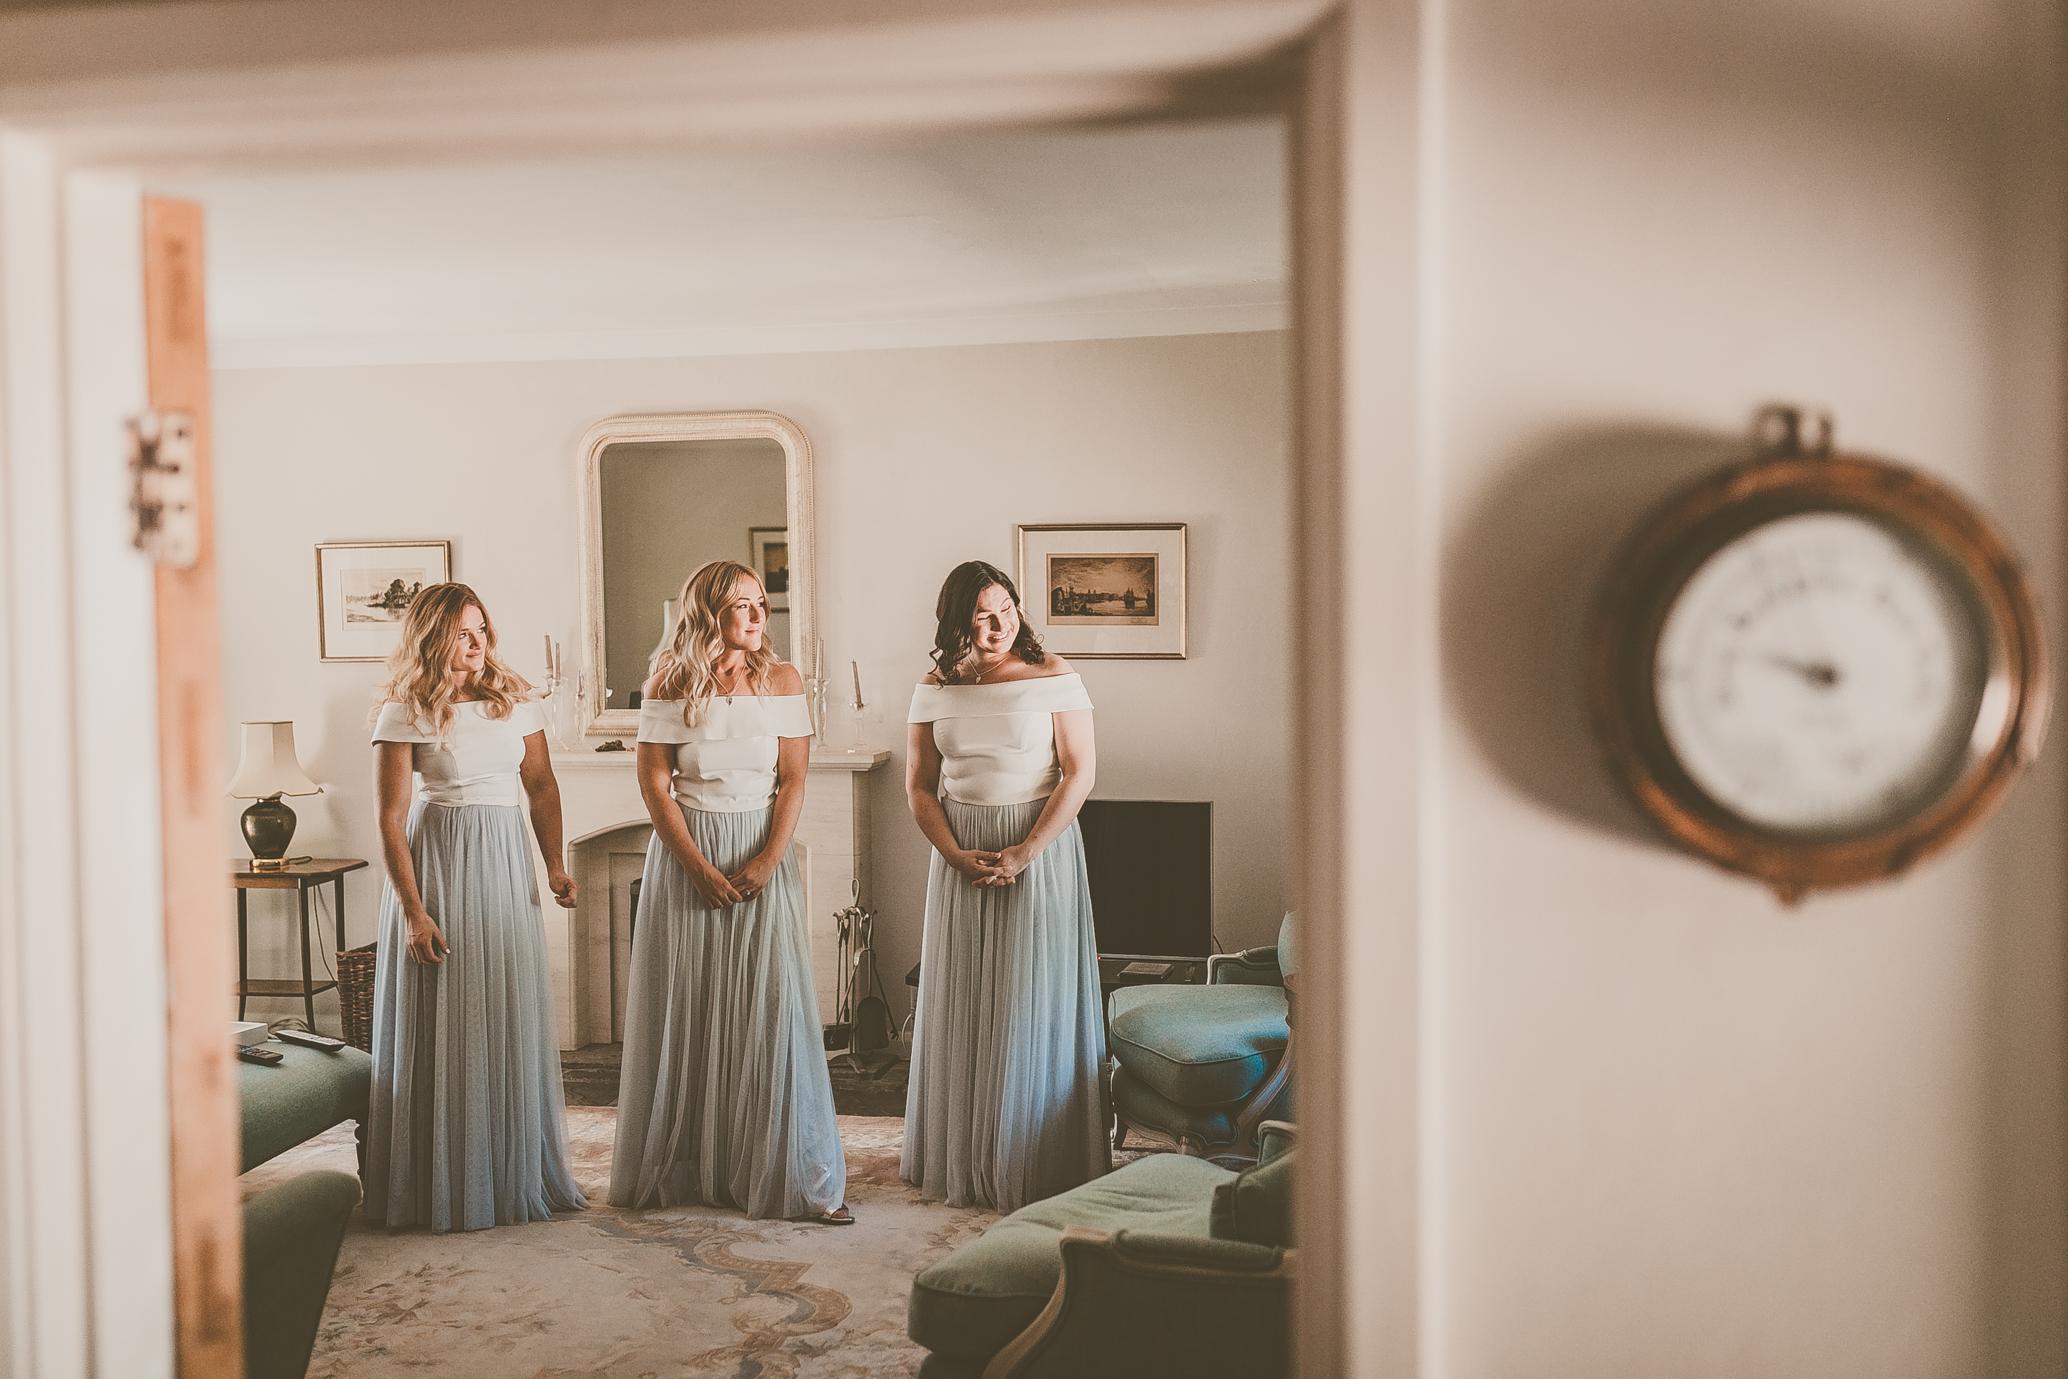 bridesmaids-getting-ready-on-wedding-morning-London